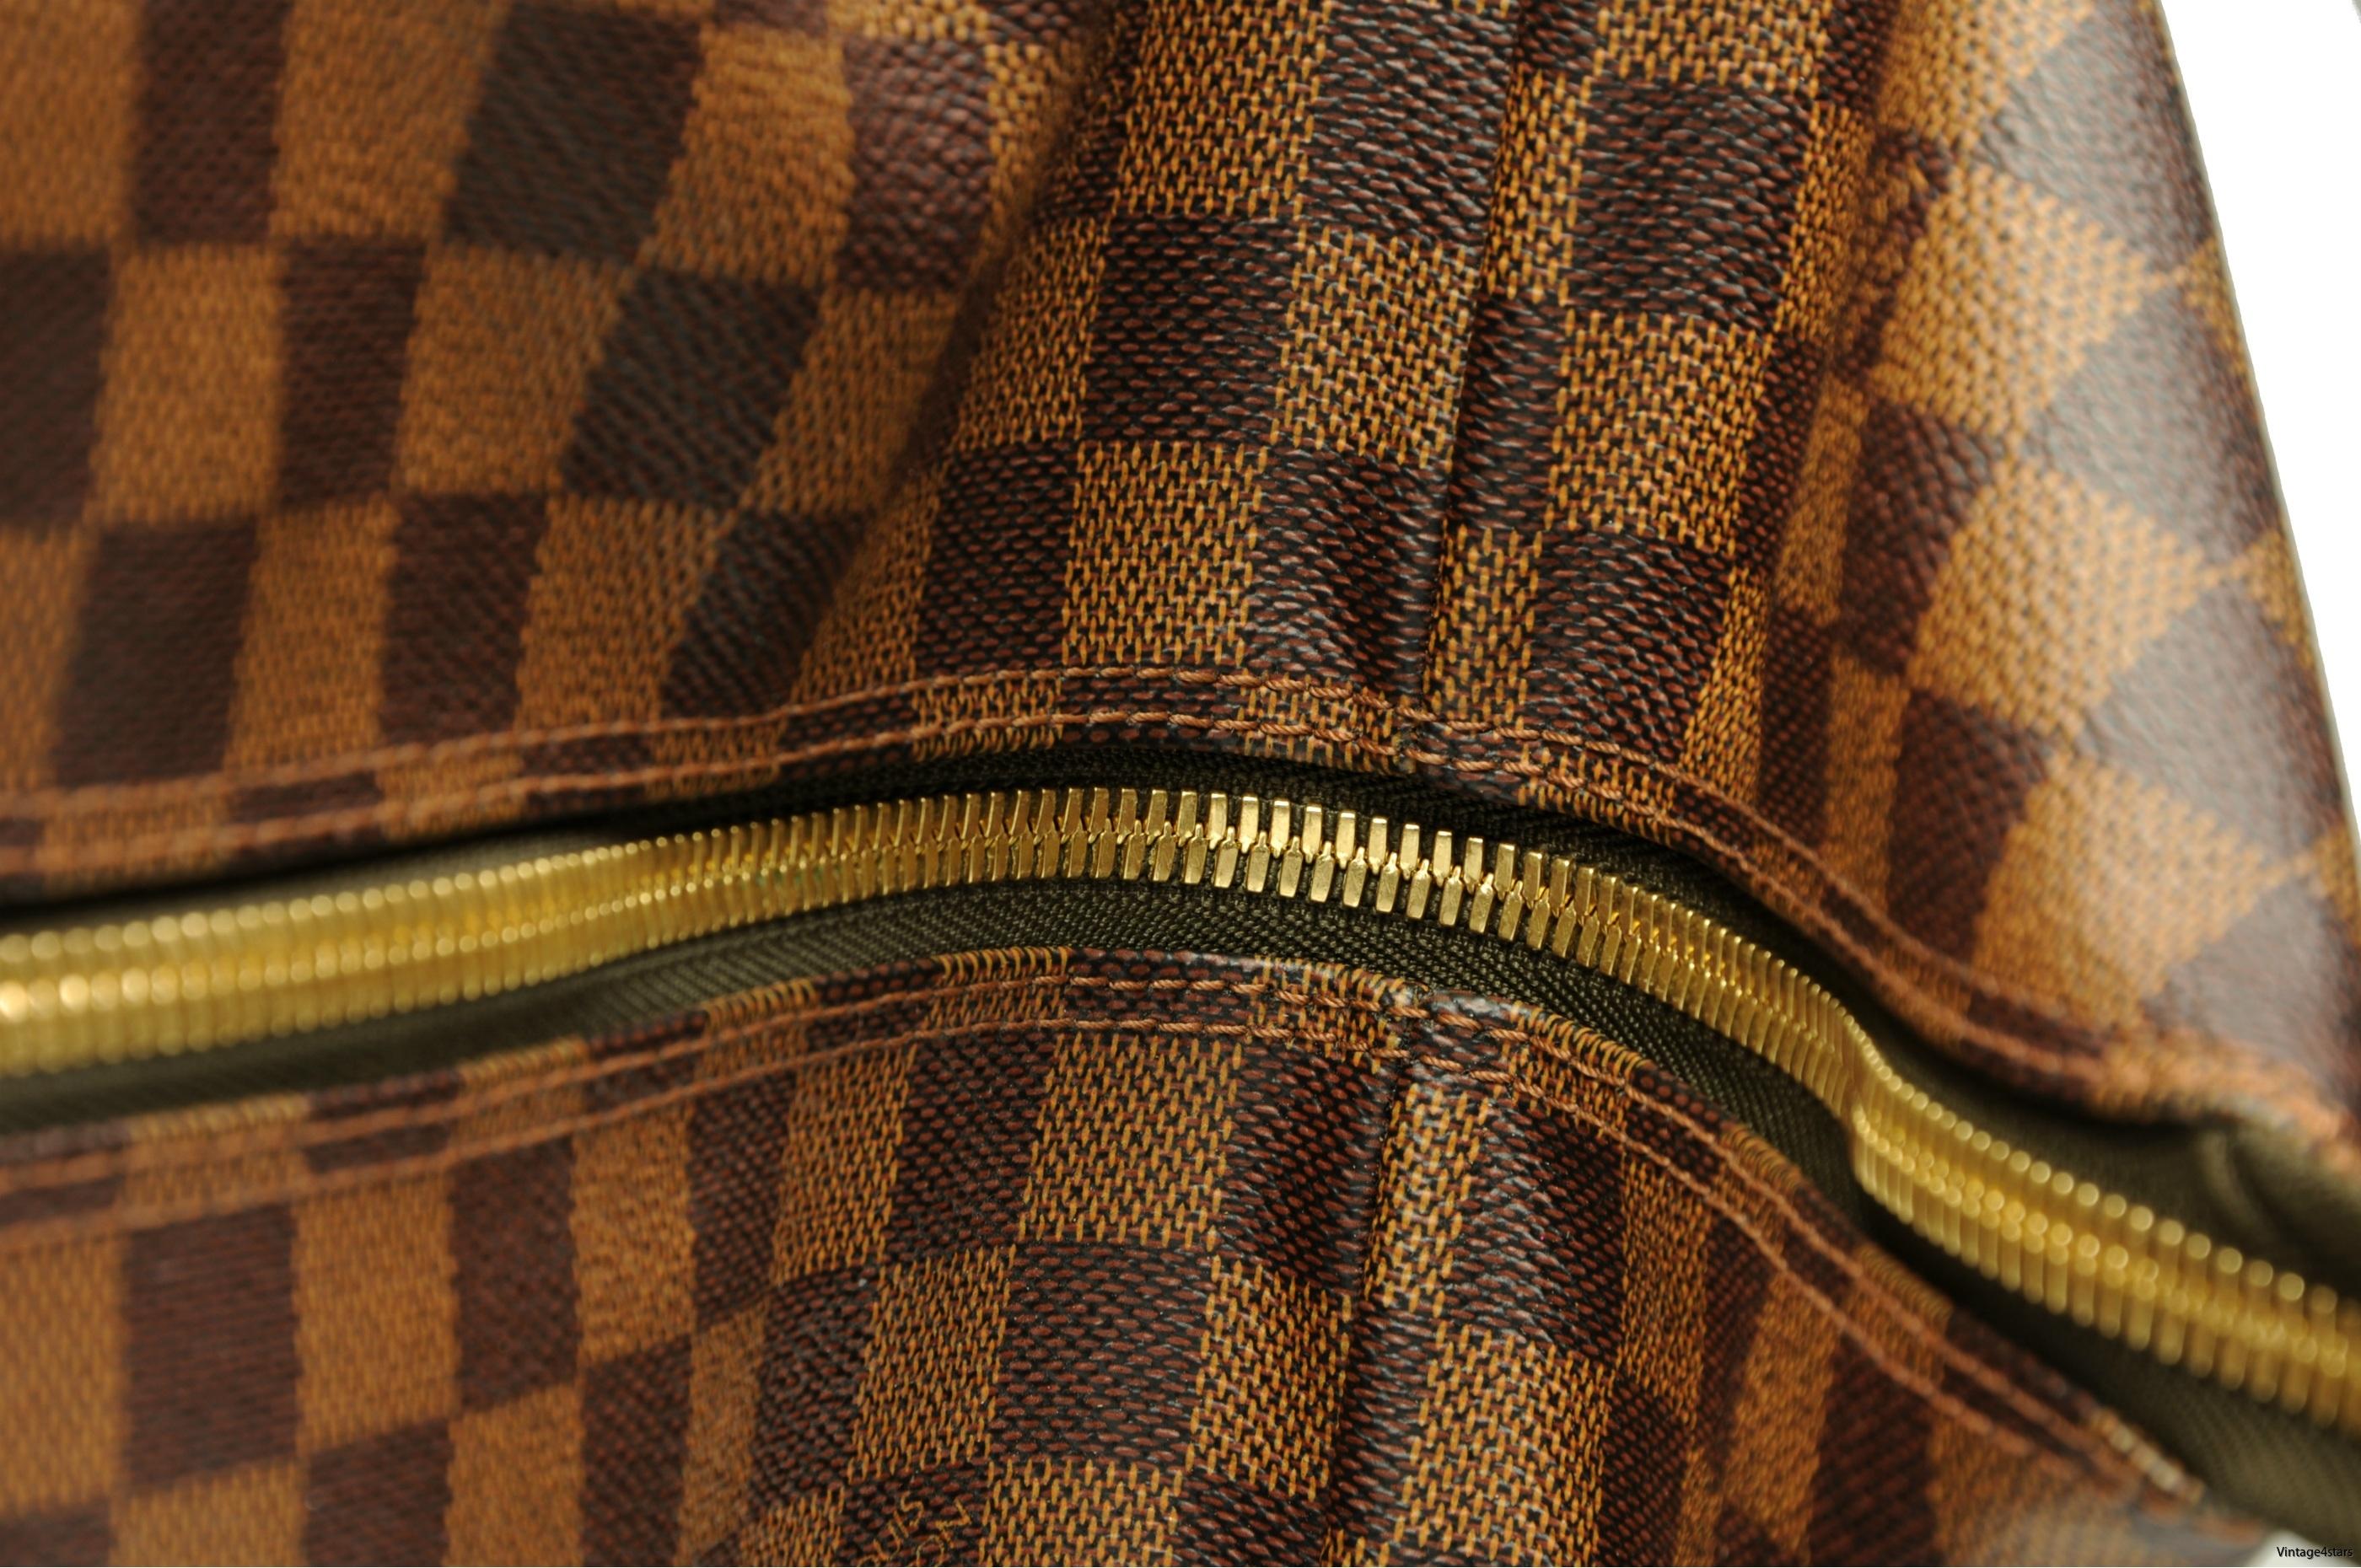 Louis Vuitton Eole 60 Damier Ebene 11